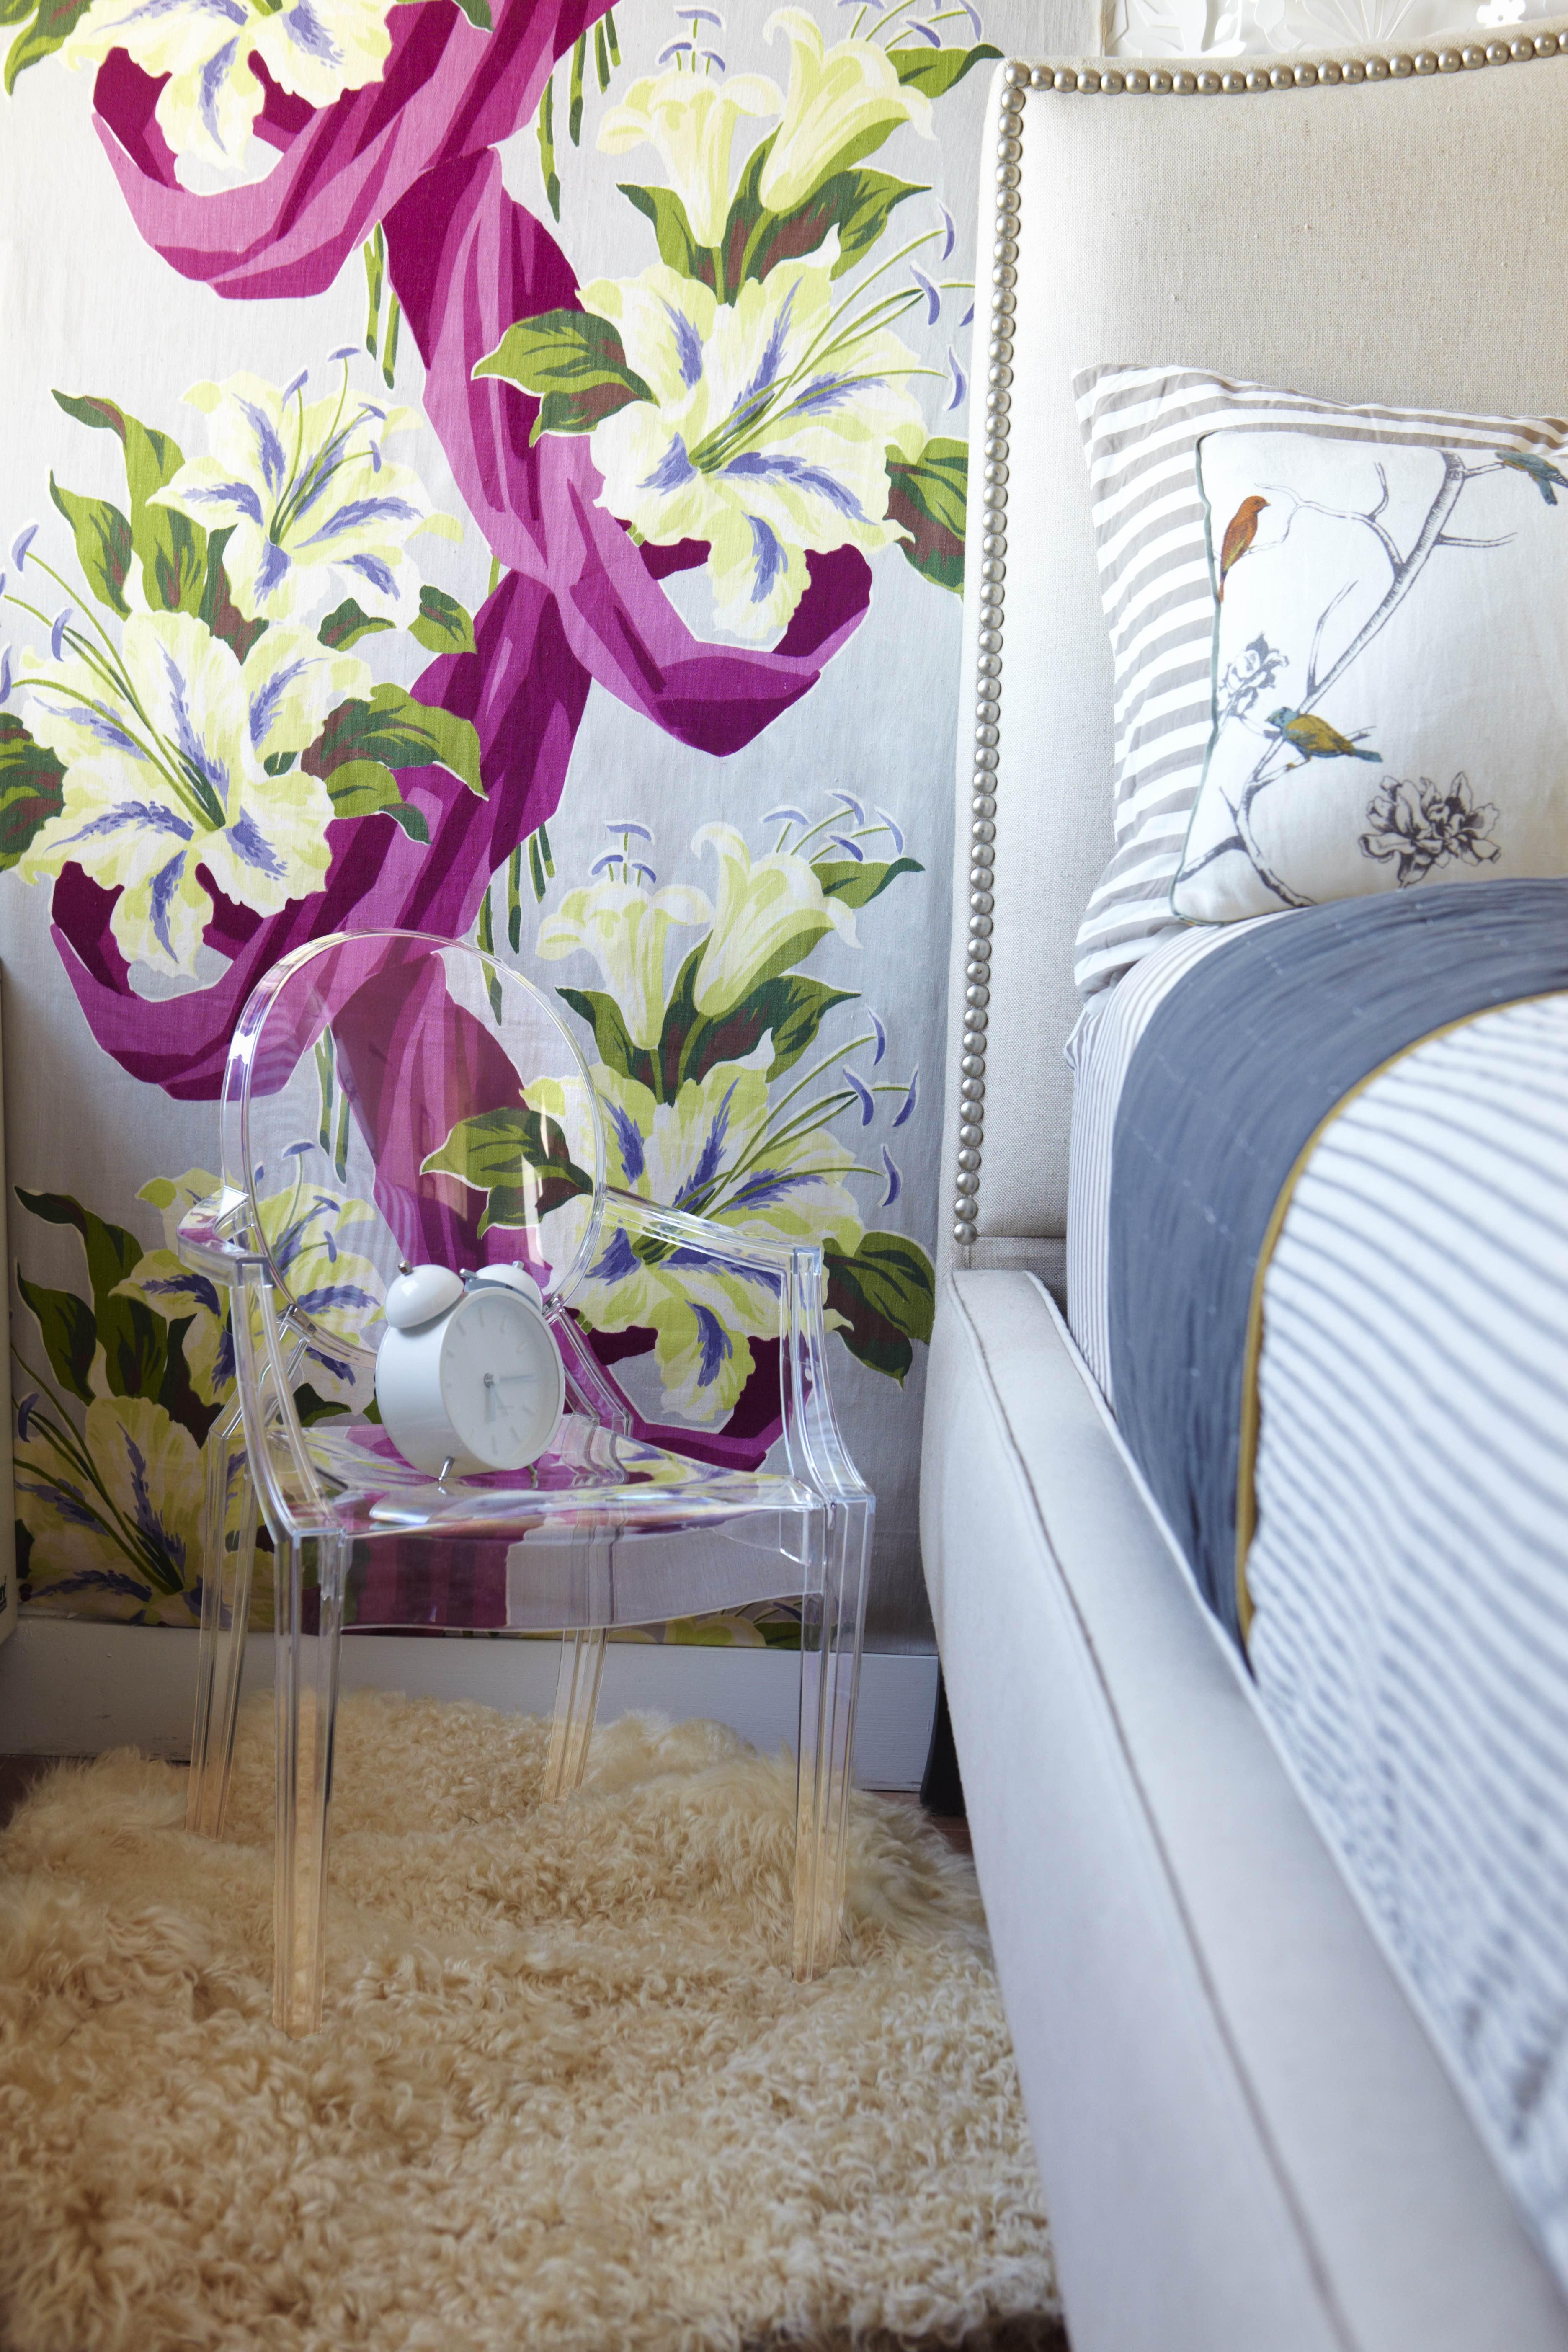 Phillipe Starke Kids Chair - Mini-Me Decor: Use Designer Kids Furniture in Adult Ways